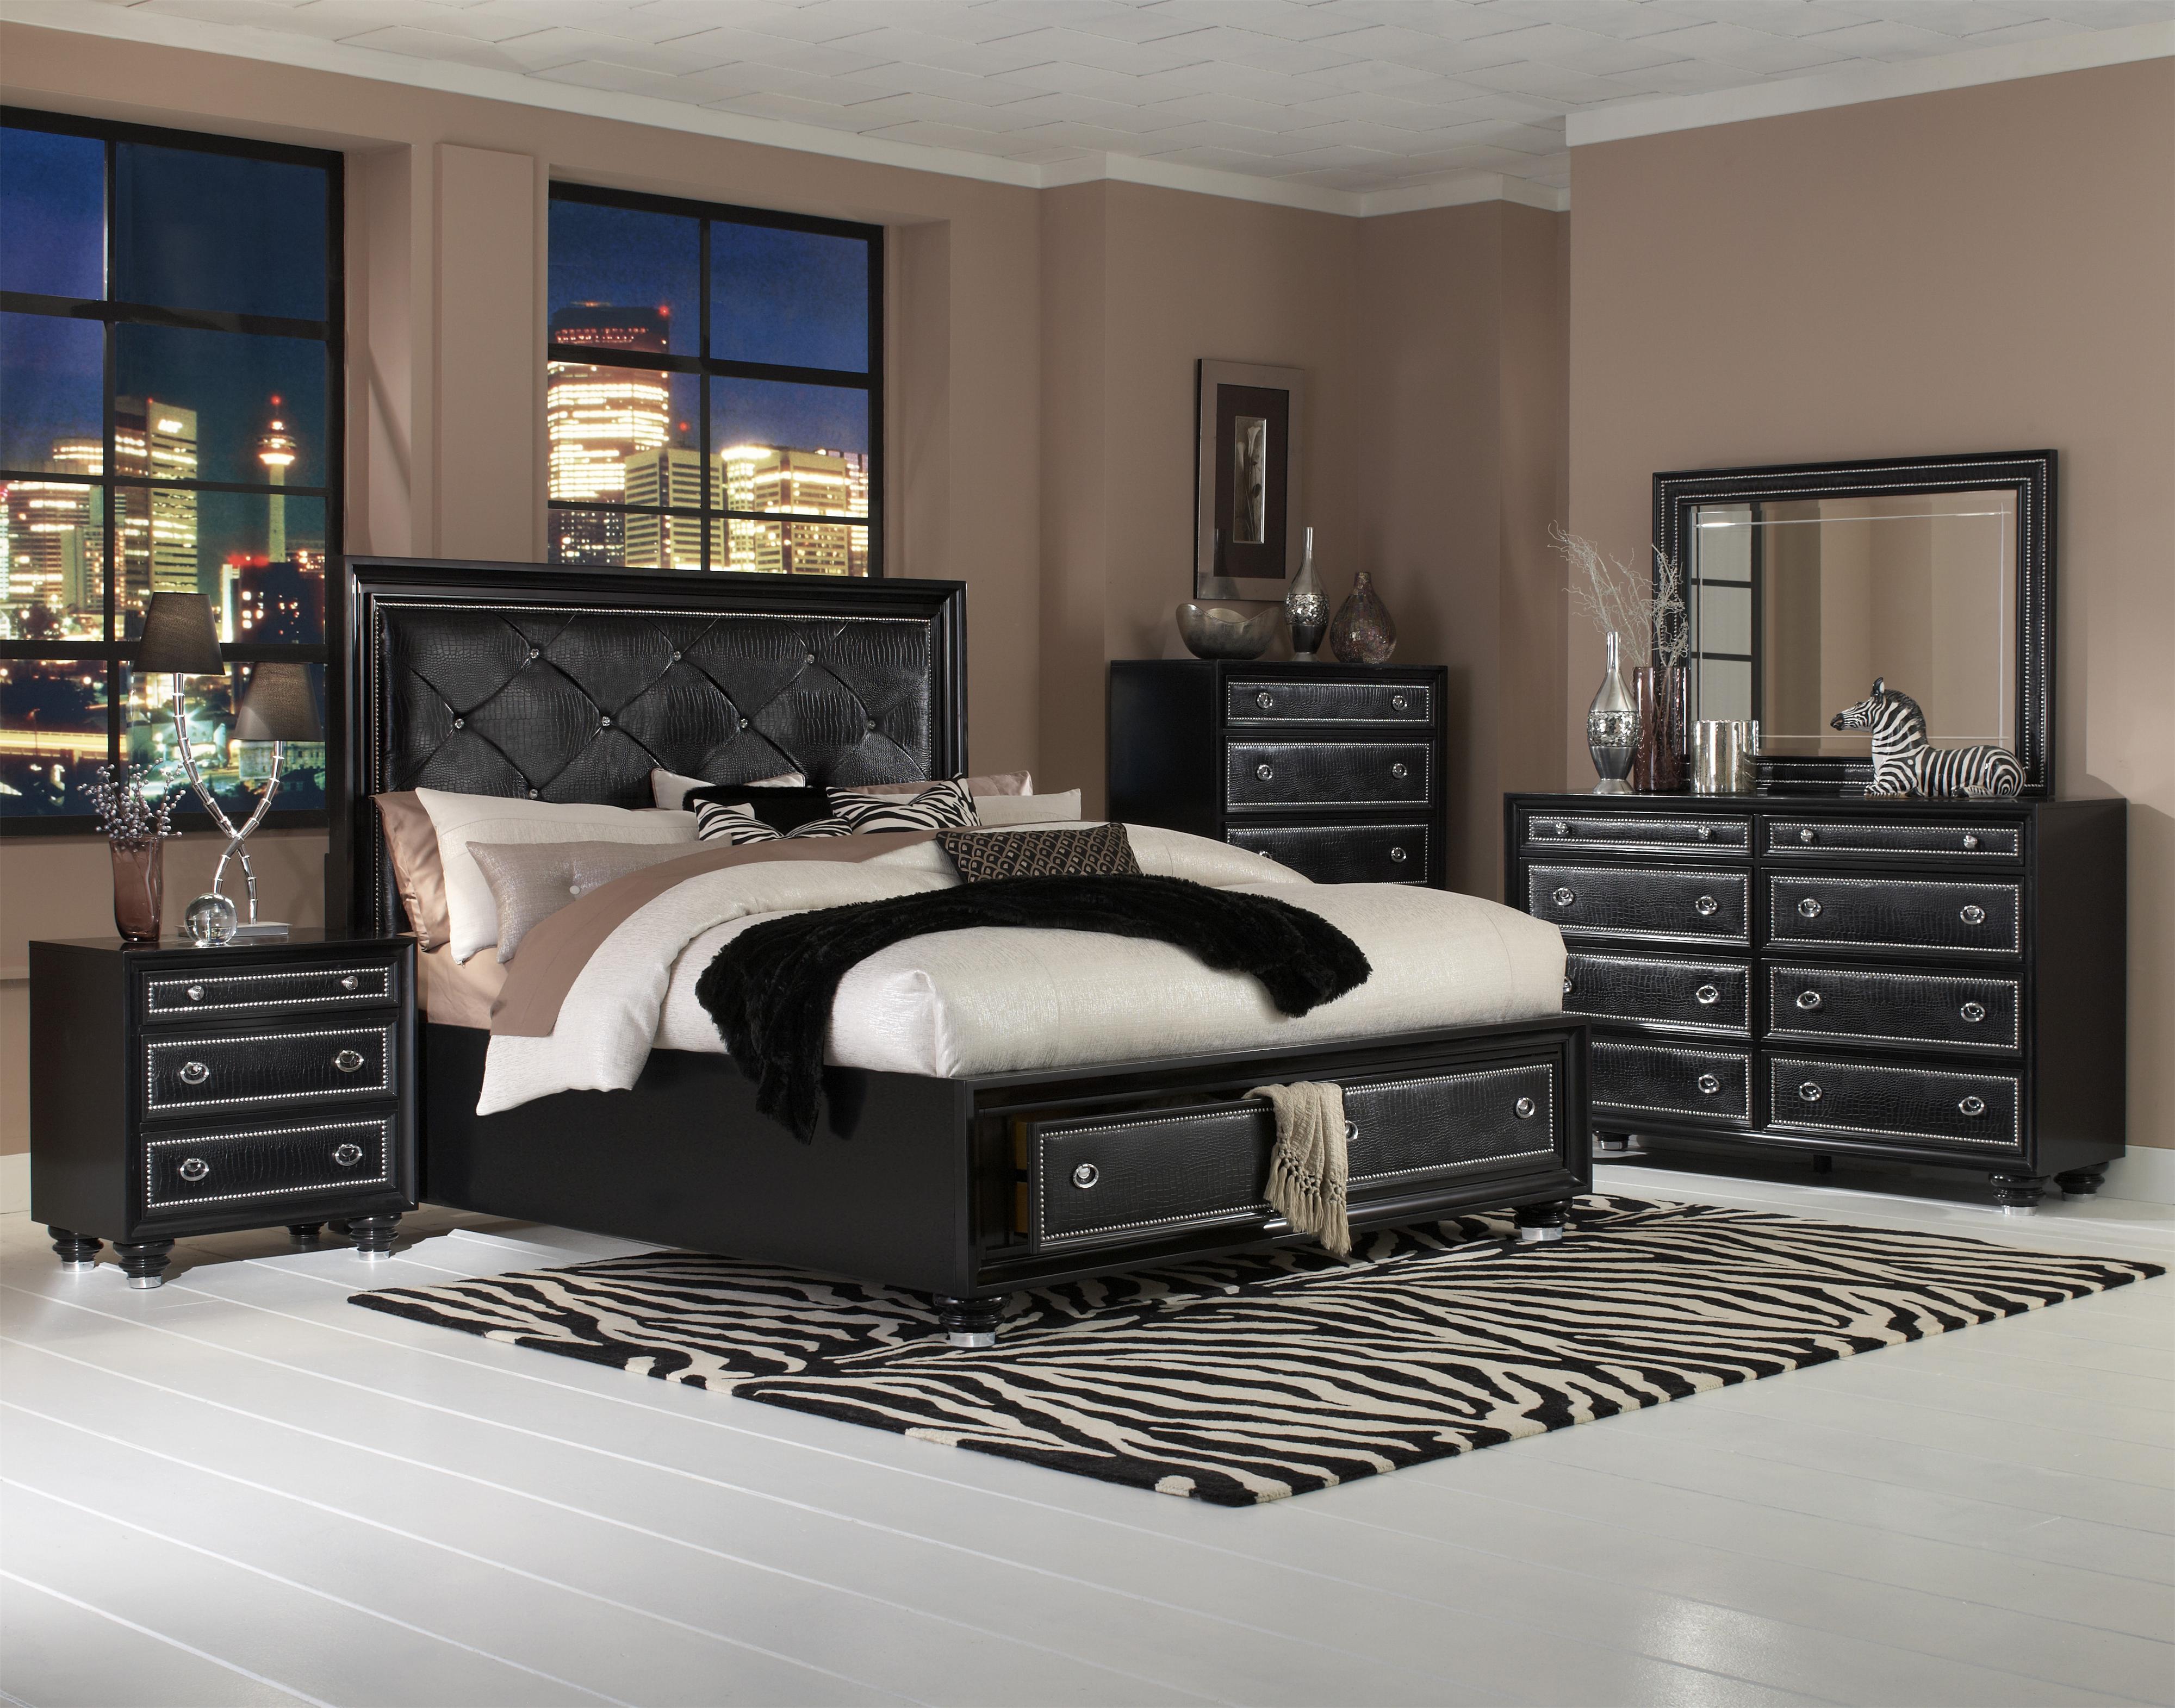 Magnussen Home Onyx Bedroom California King Bedroom Group   AHFA   Bedroom  Group Dealer Locator